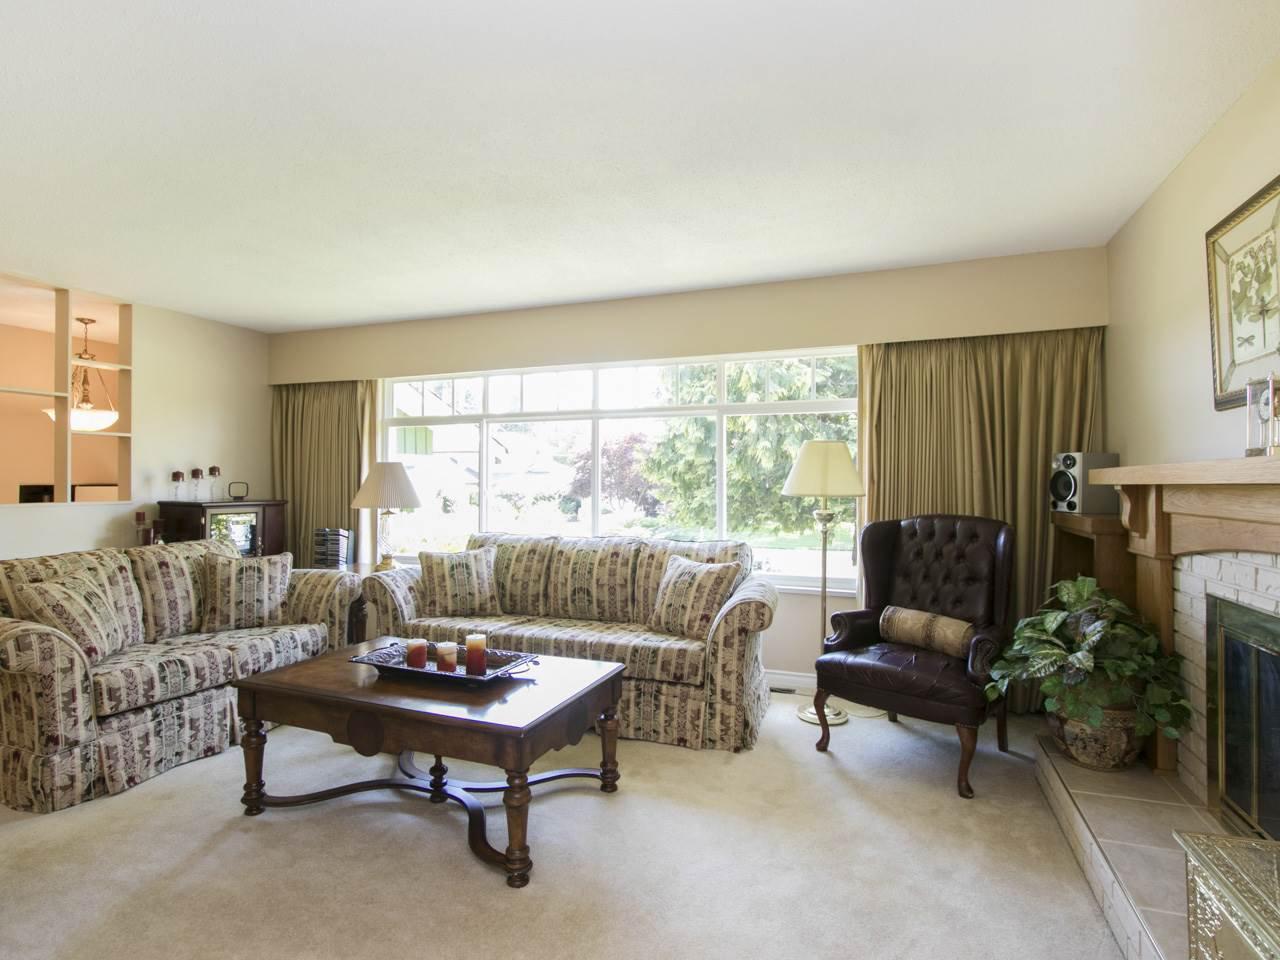 Main Photo: 4843 7A Avenue in Delta: Tsawwassen Central House for sale (Tsawwassen)  : MLS®# R2218386